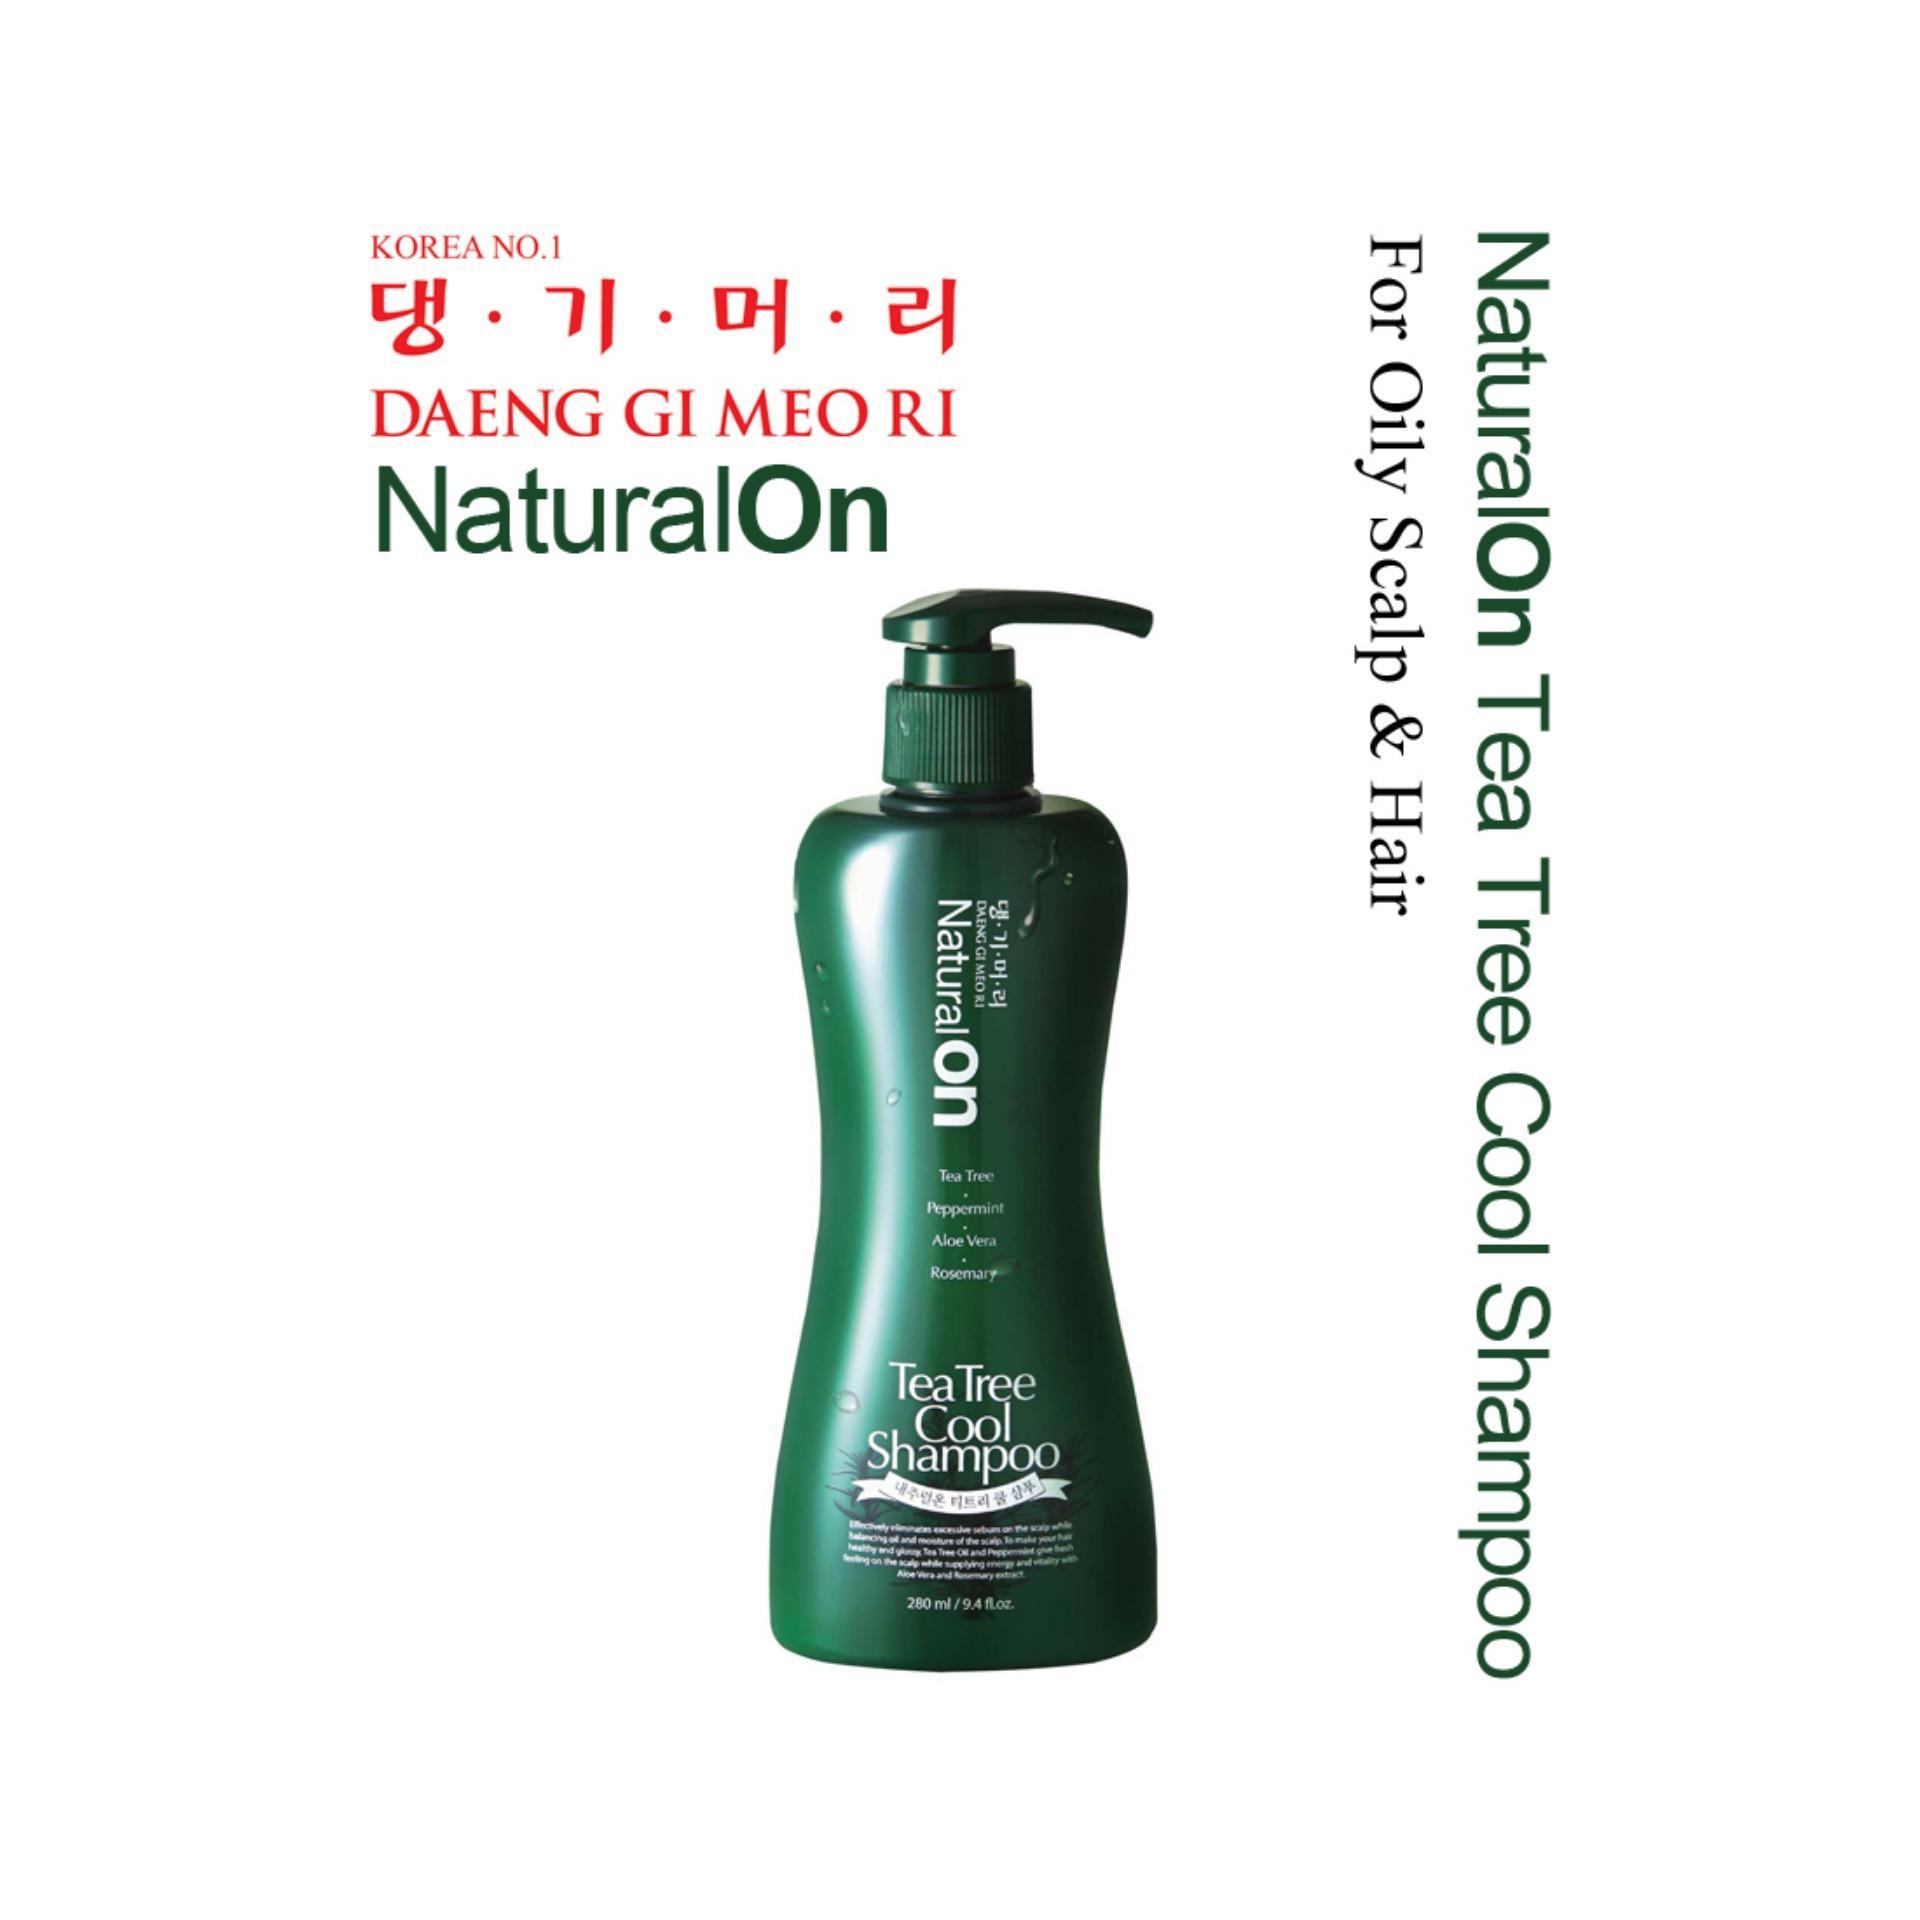 Natur Natural Extract Shampoo Tea Tree Oil 140ml Review Harga Essential Minyak Sari Reo 08 Latest Daeng Gi Meo Ri Hair Care Products Enjoy Huge Discounts Lazada Sg